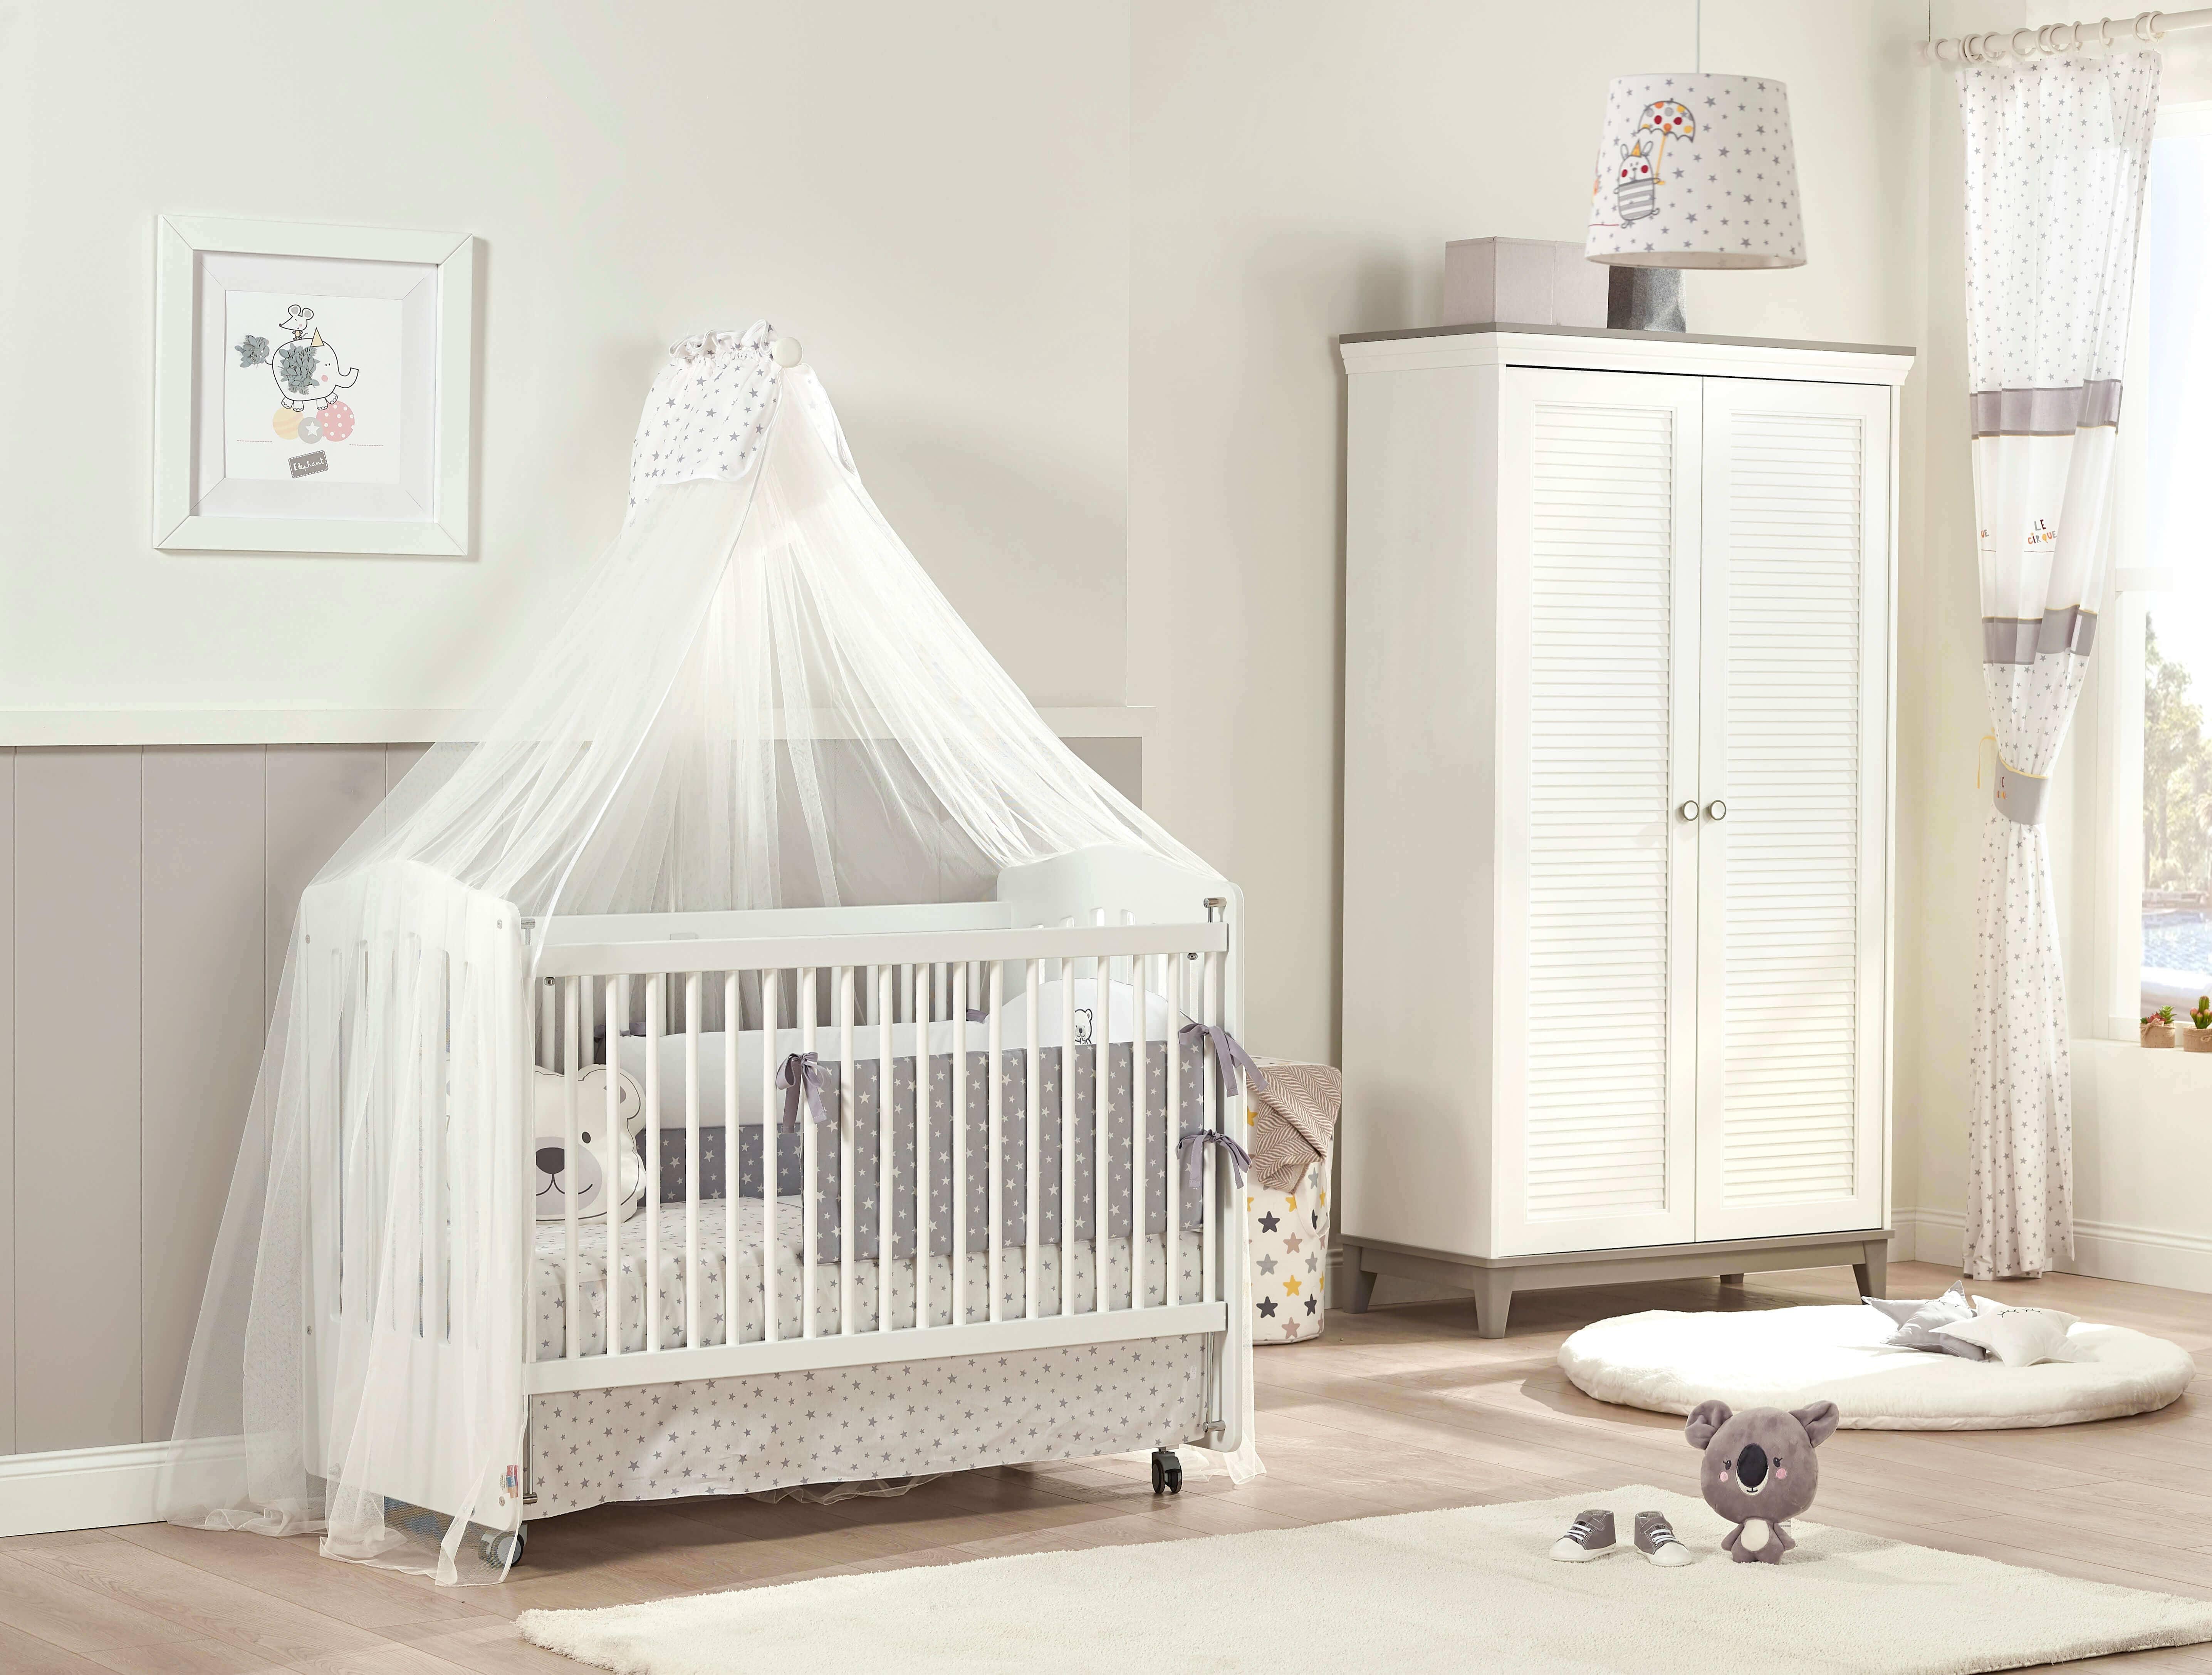 Almila Babyzimmer Set Mia mit Säuglingsbett 60x120 cm